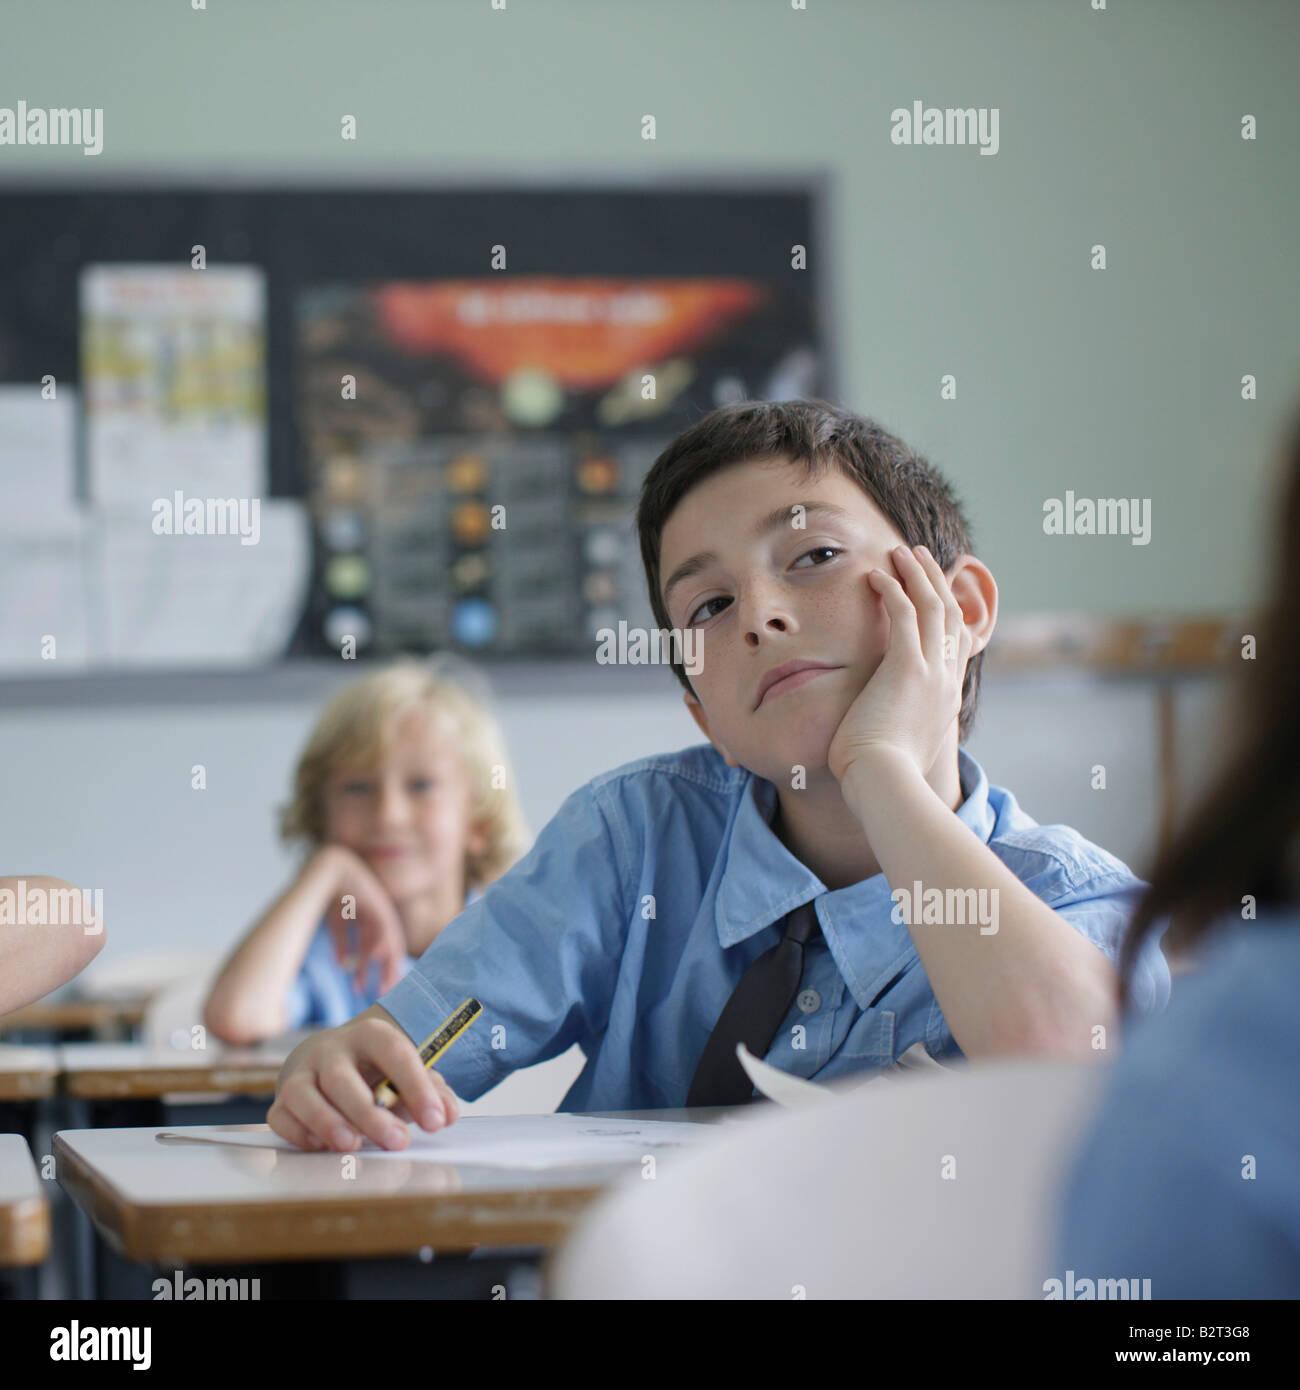 School boy listening in class - Stock Image